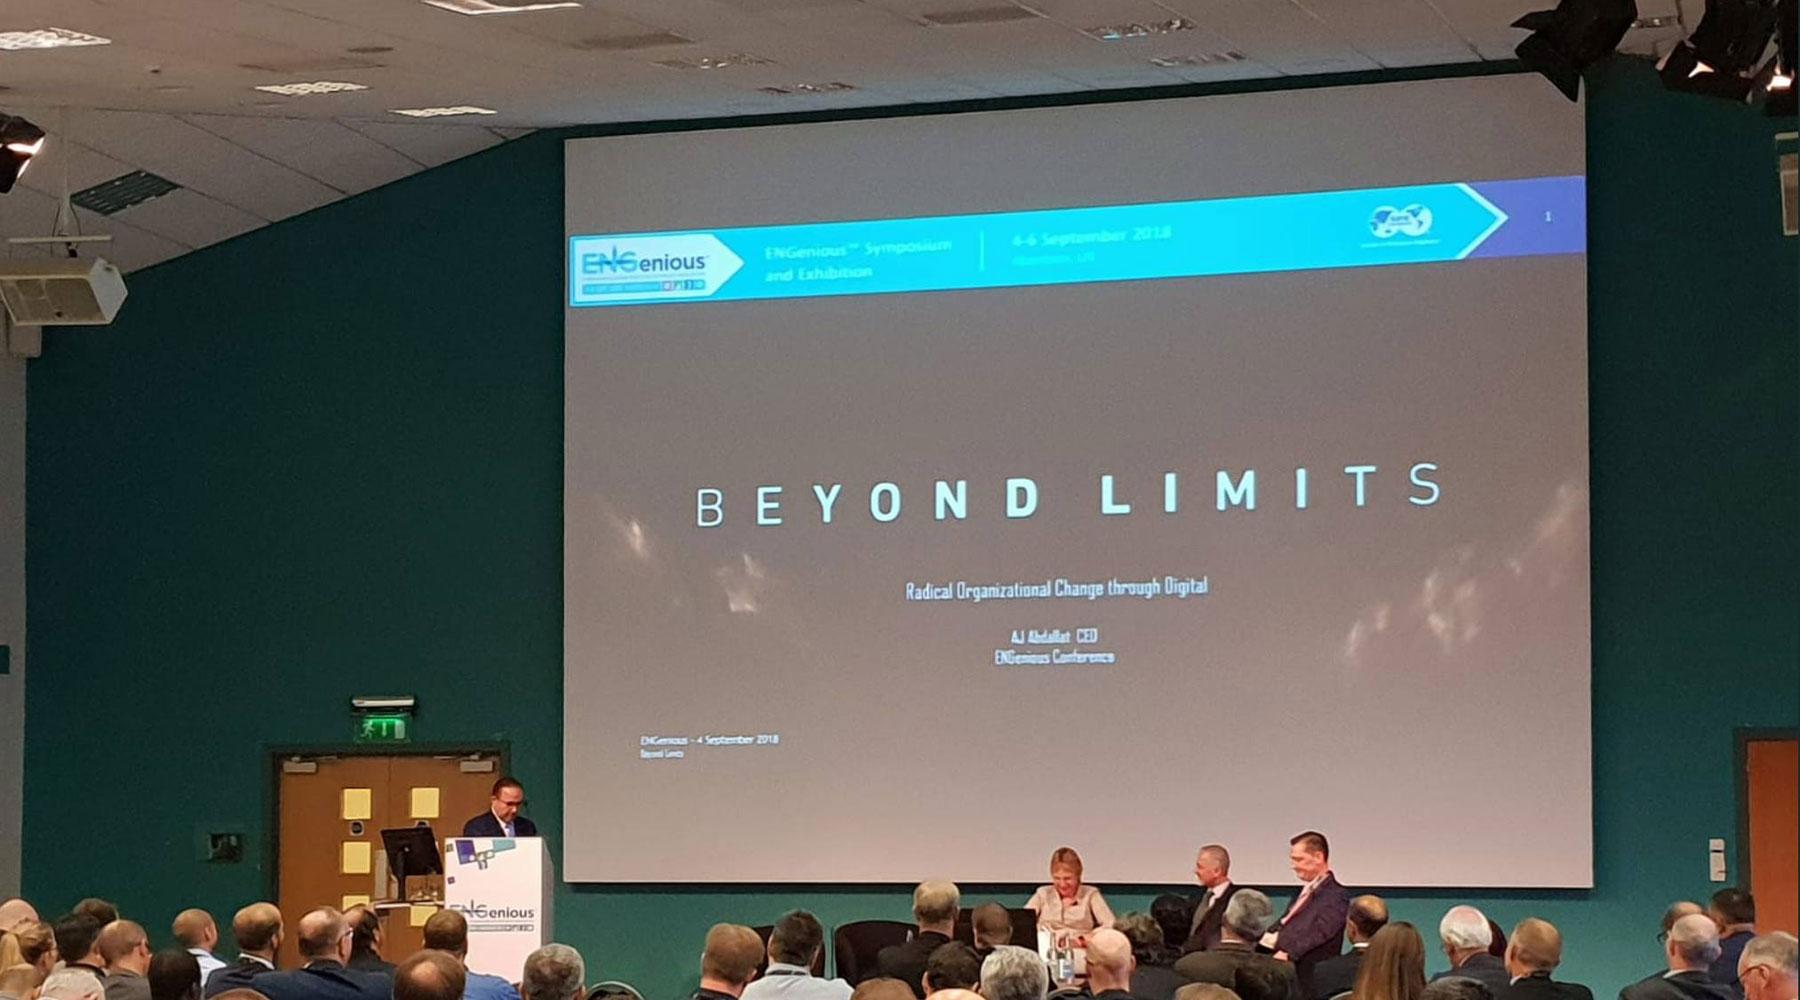 AJ Abdallat Pushing Artificial Intelligence Beyond Limits